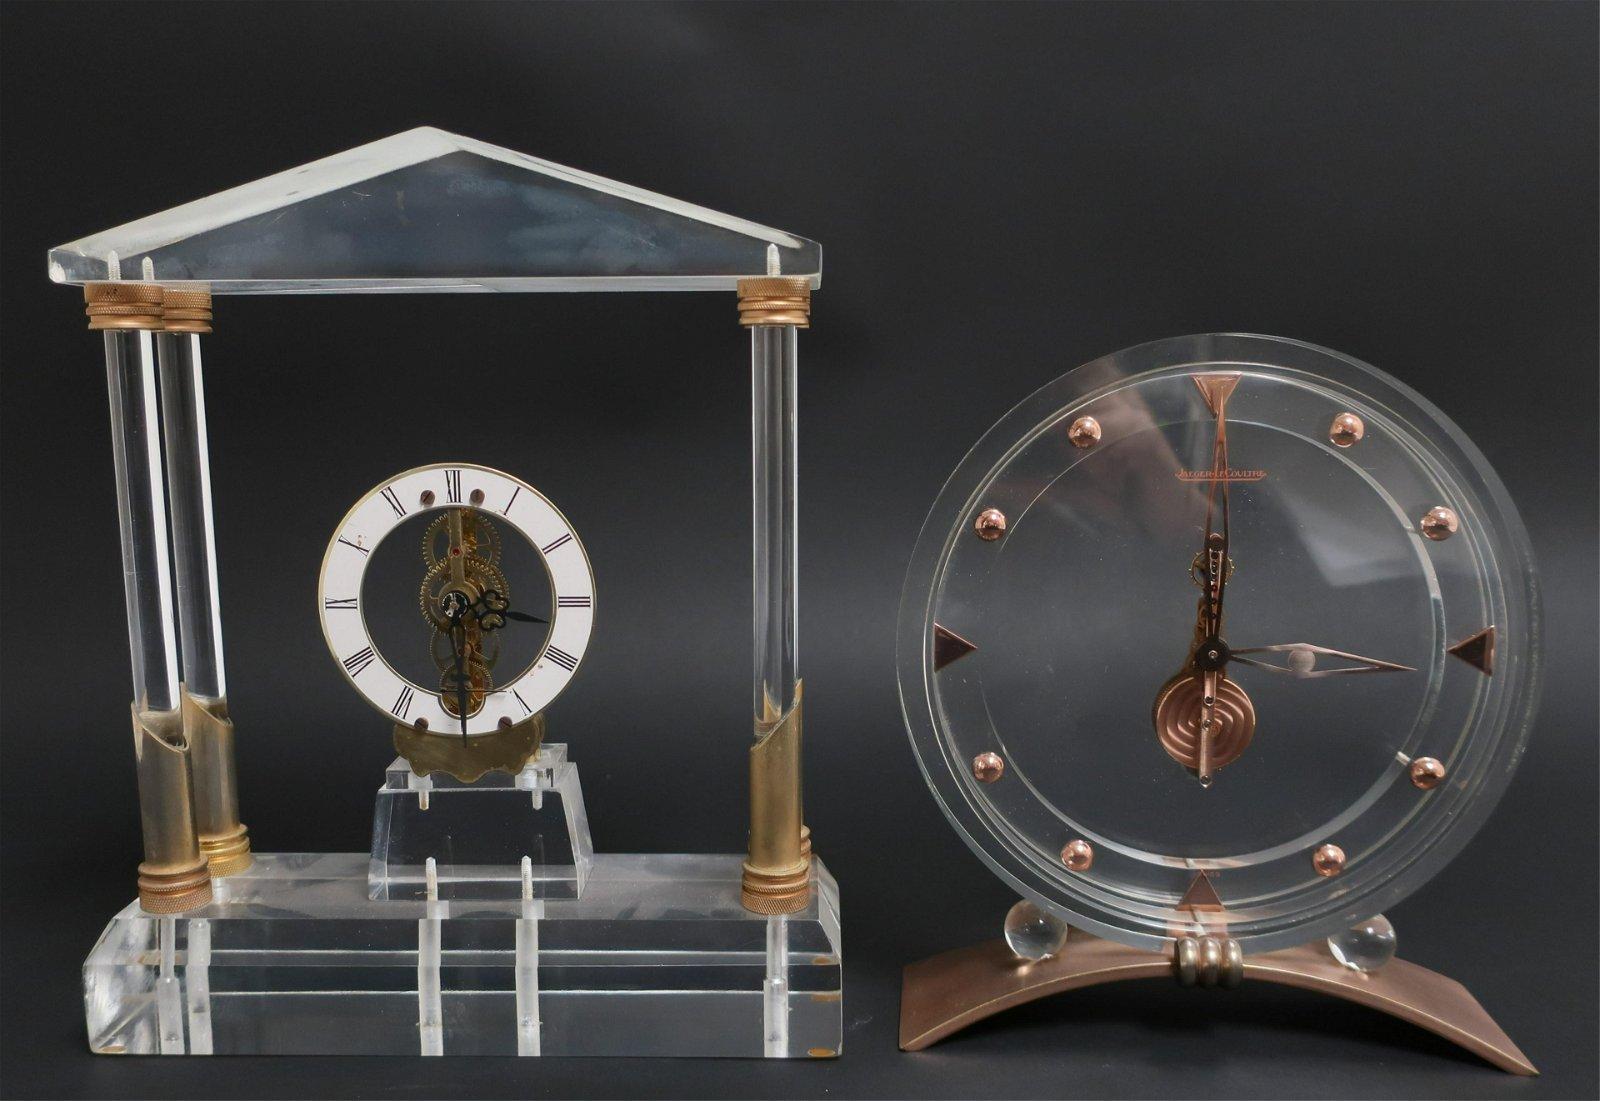 Jaeger LeCoultre Desk Clock & Other Clock